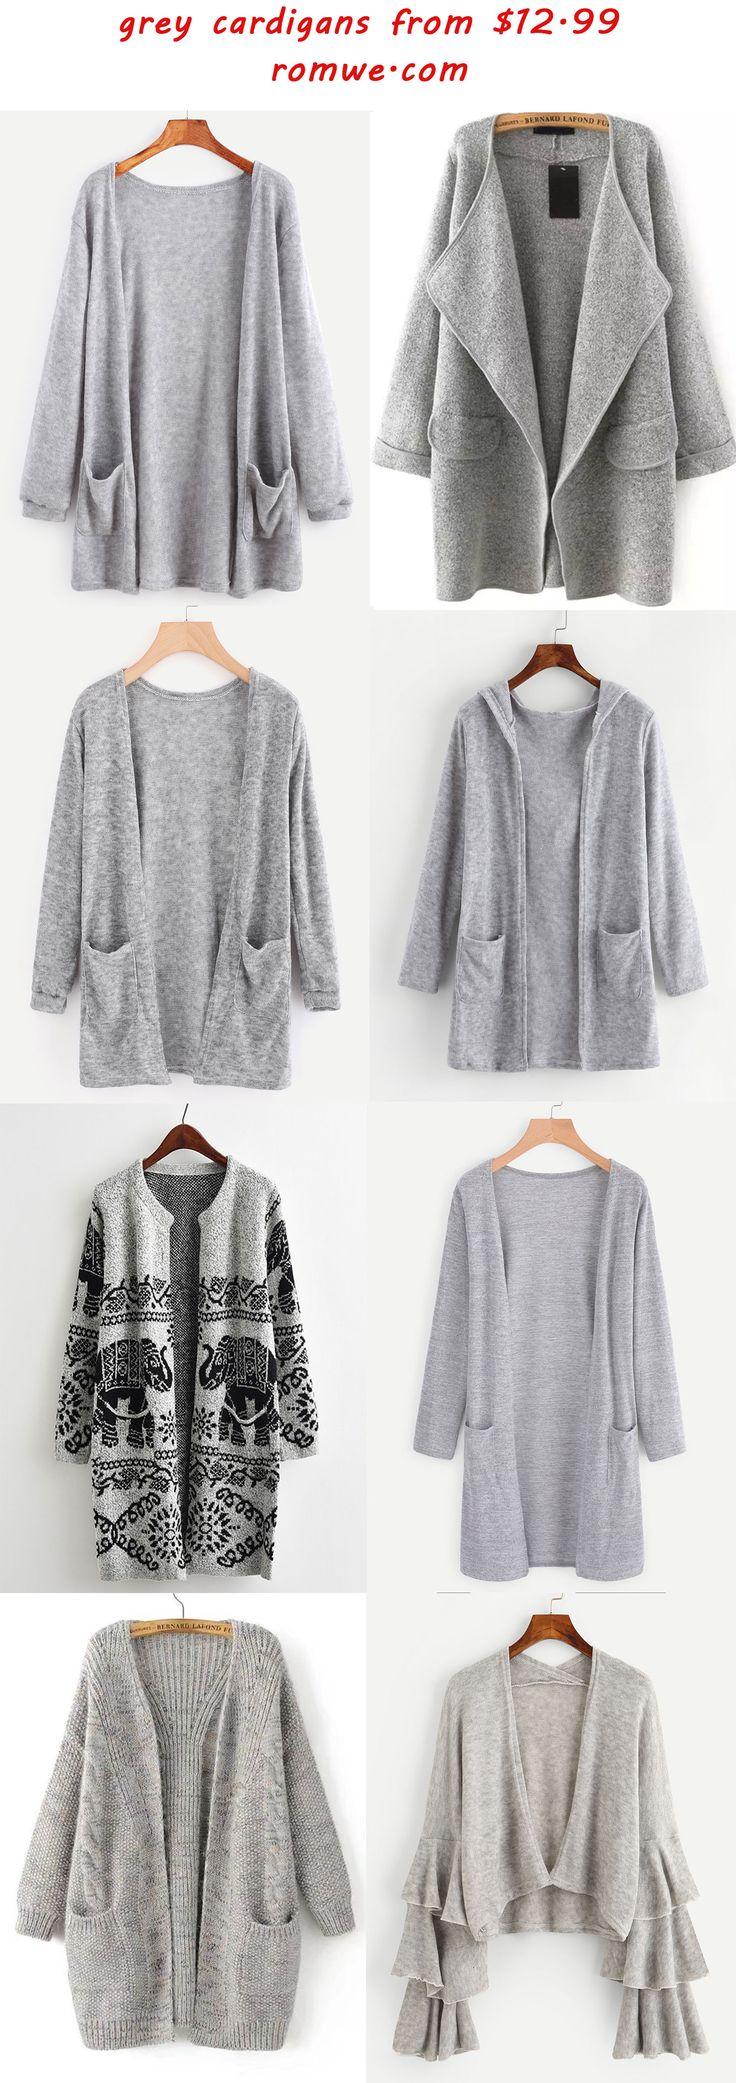 grey cardigans 2017 - romwe.com